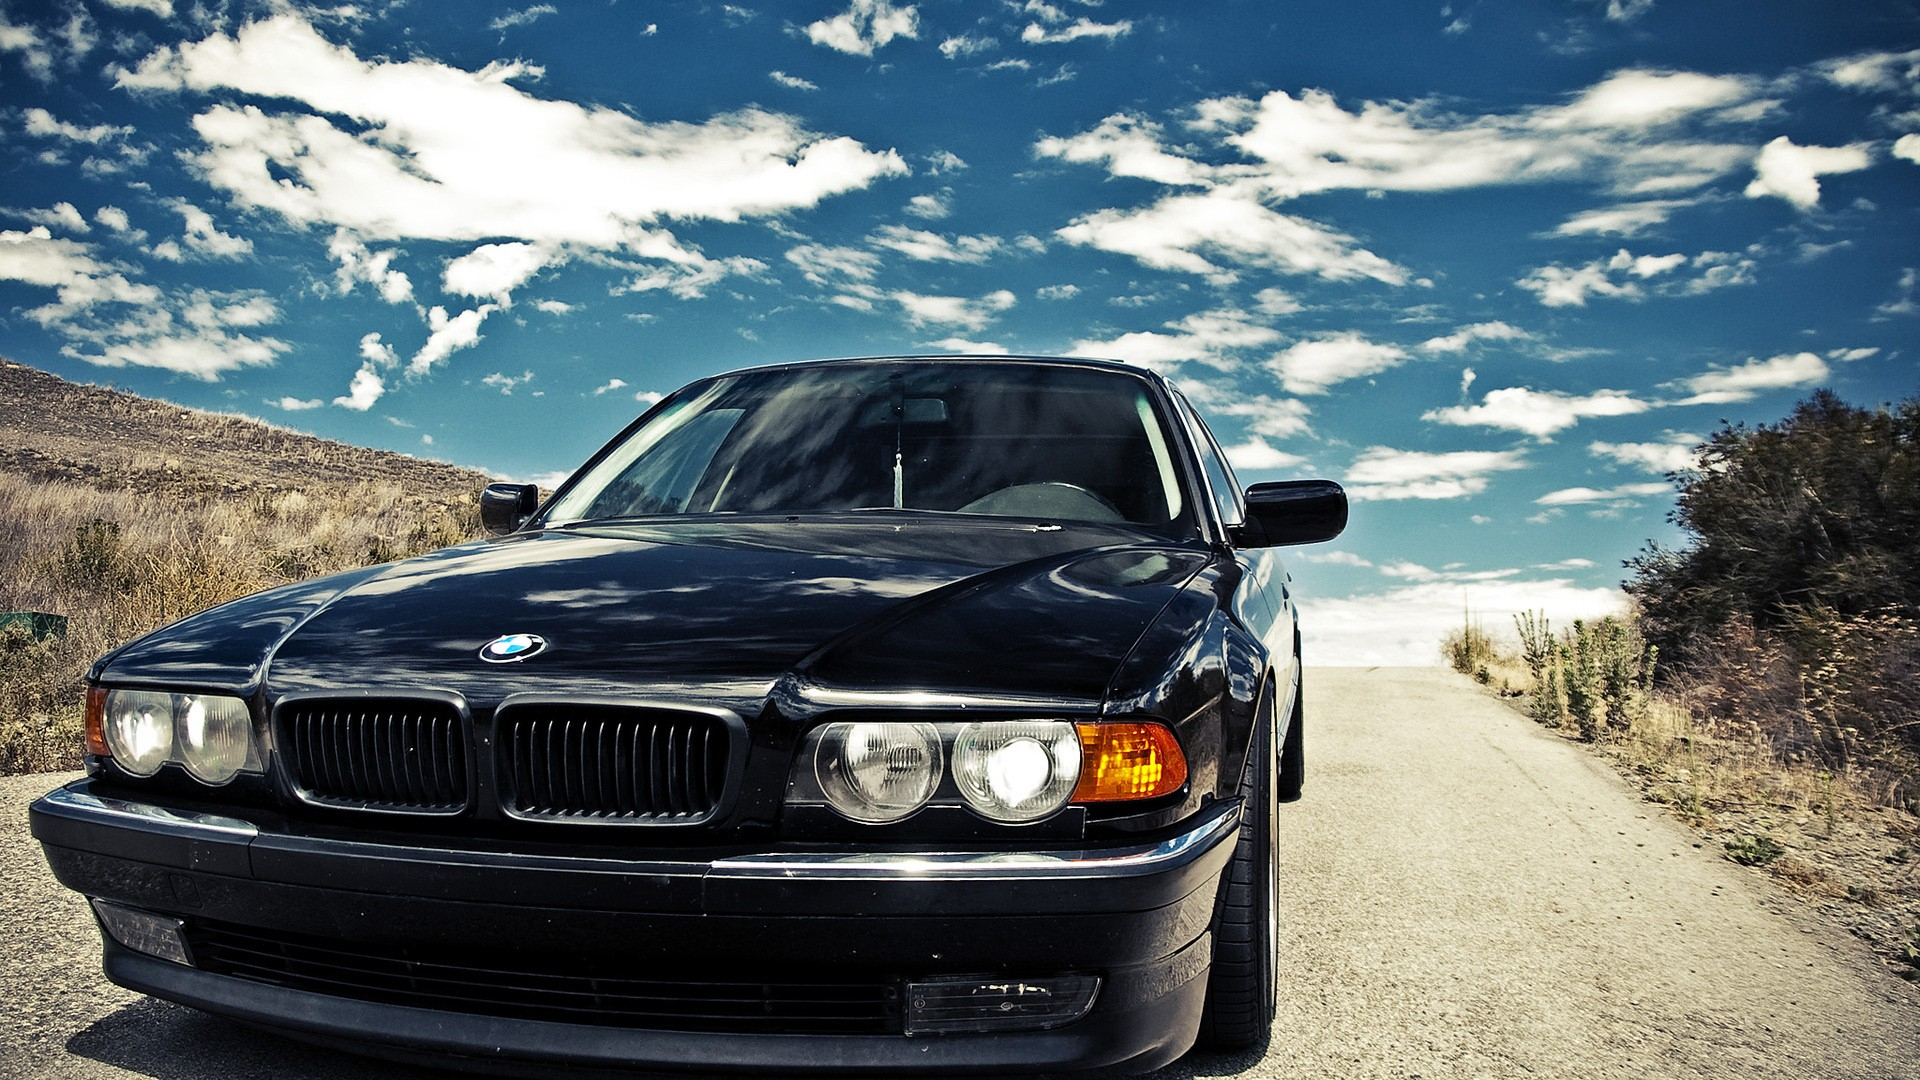 Bmw Hd Wallpapers Background: Black Bmw Wallpaper 27 Background